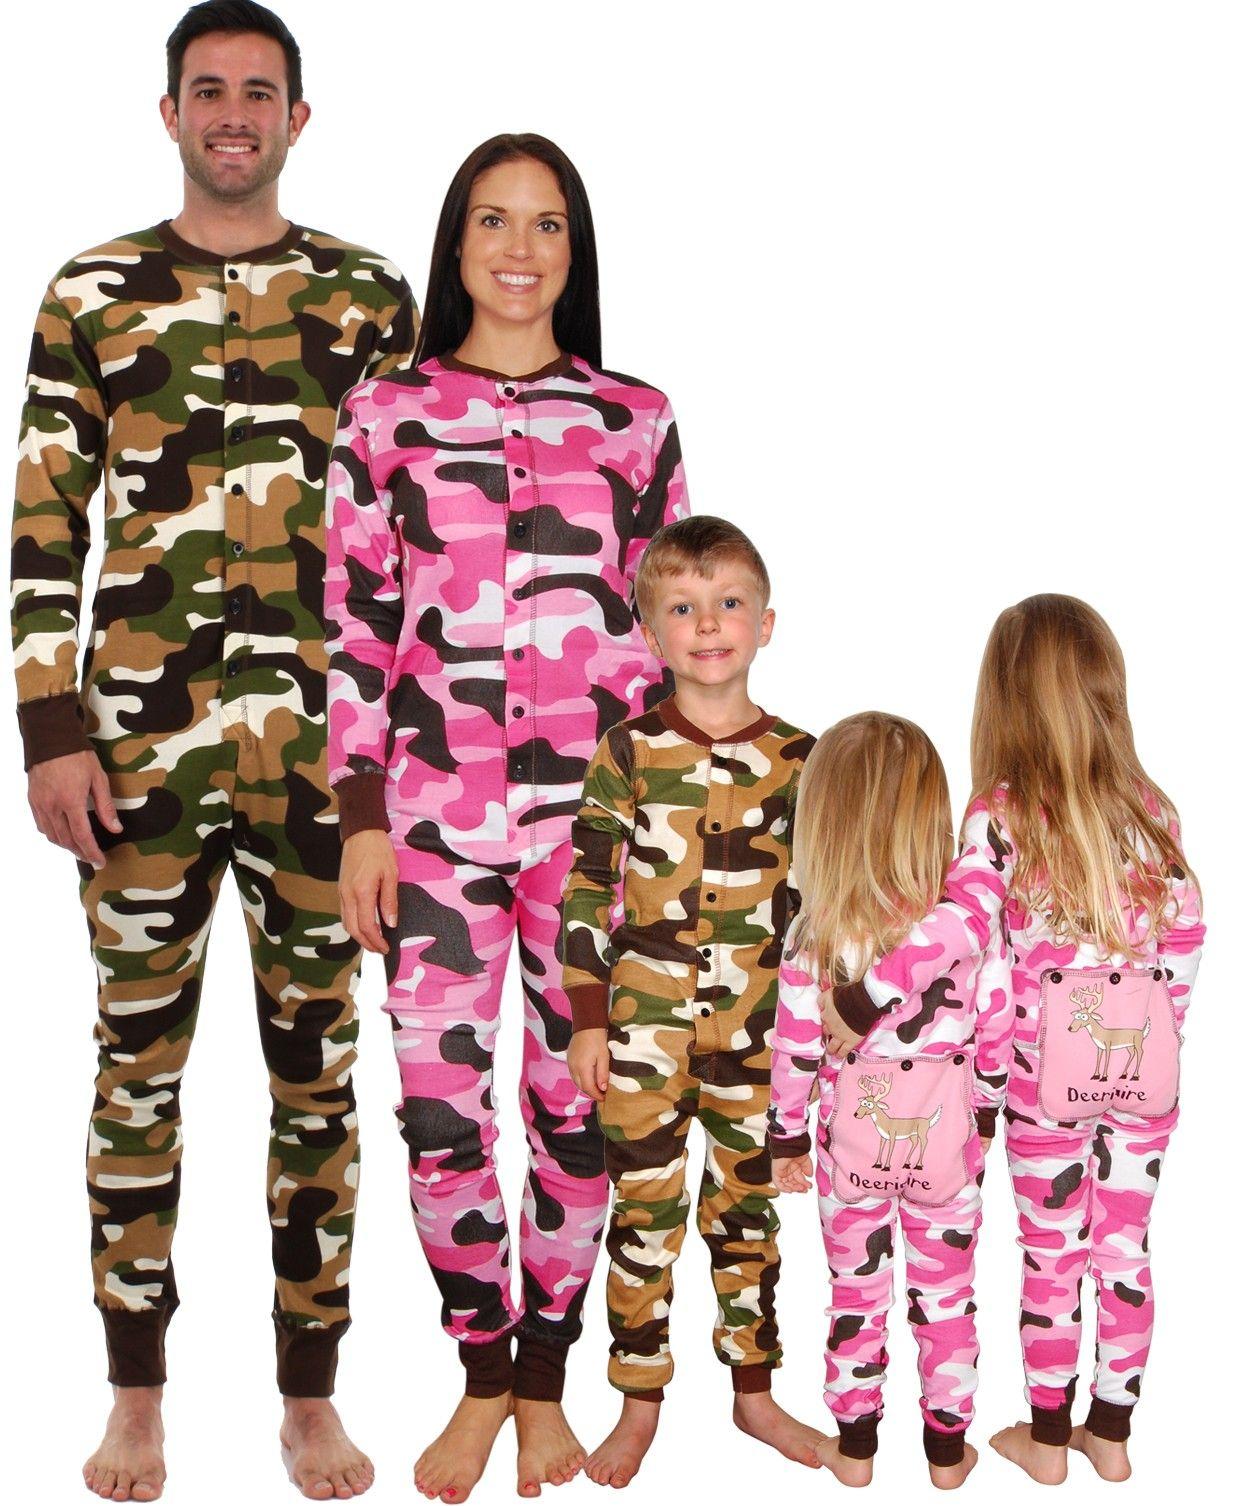 Lazy One Toddler Pink Camo Flapjack Long John Deeriaire Long Sleeve Pajamas New